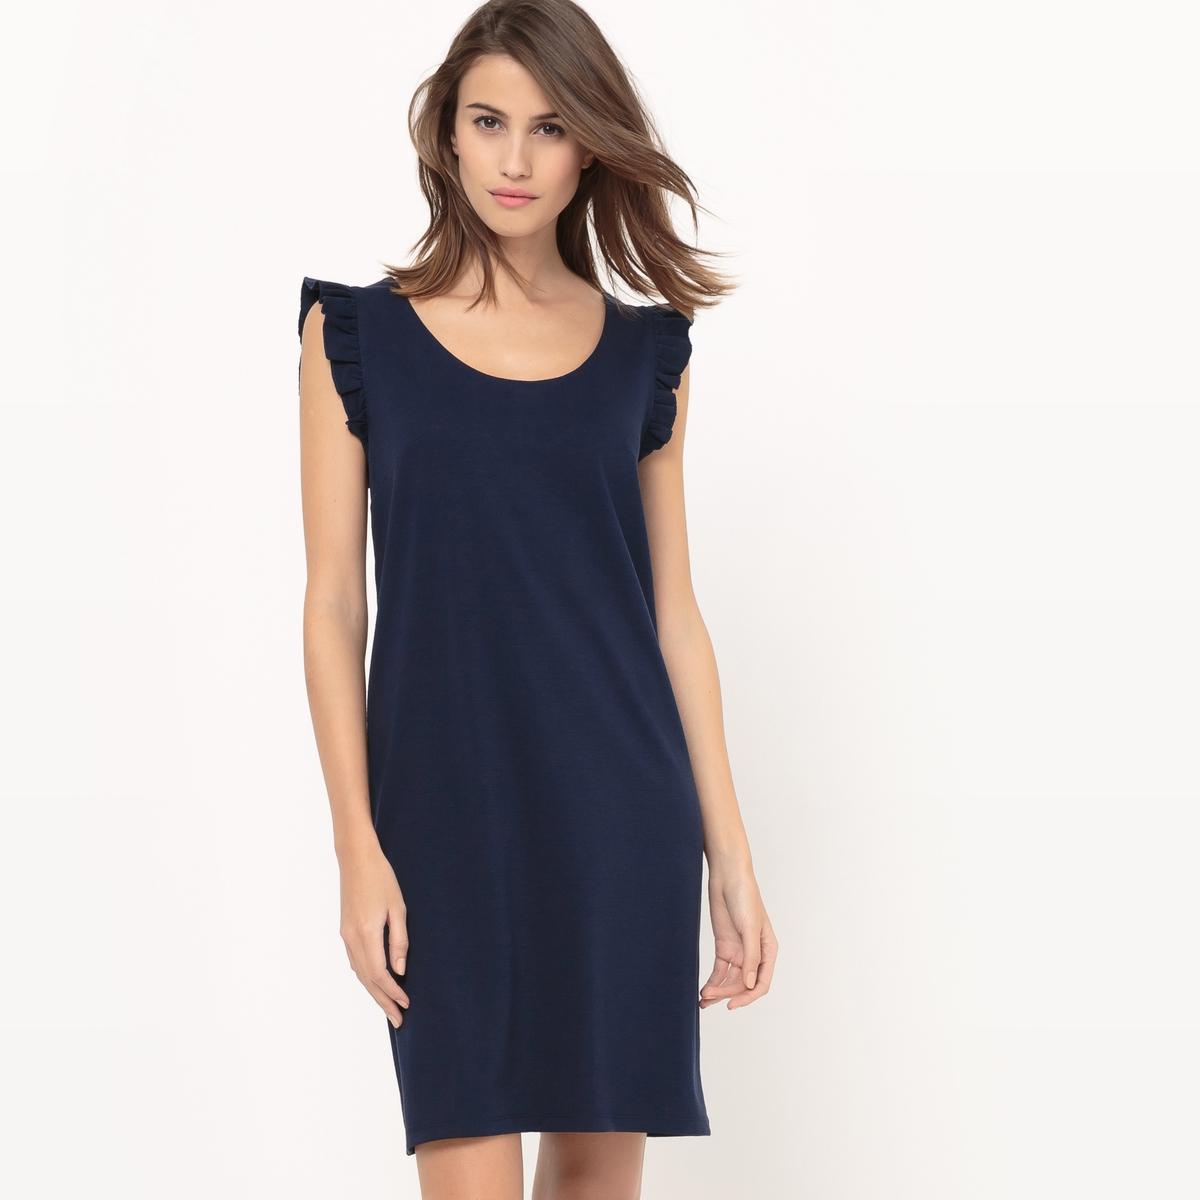 Платье-футляр из трикотажа с воланами